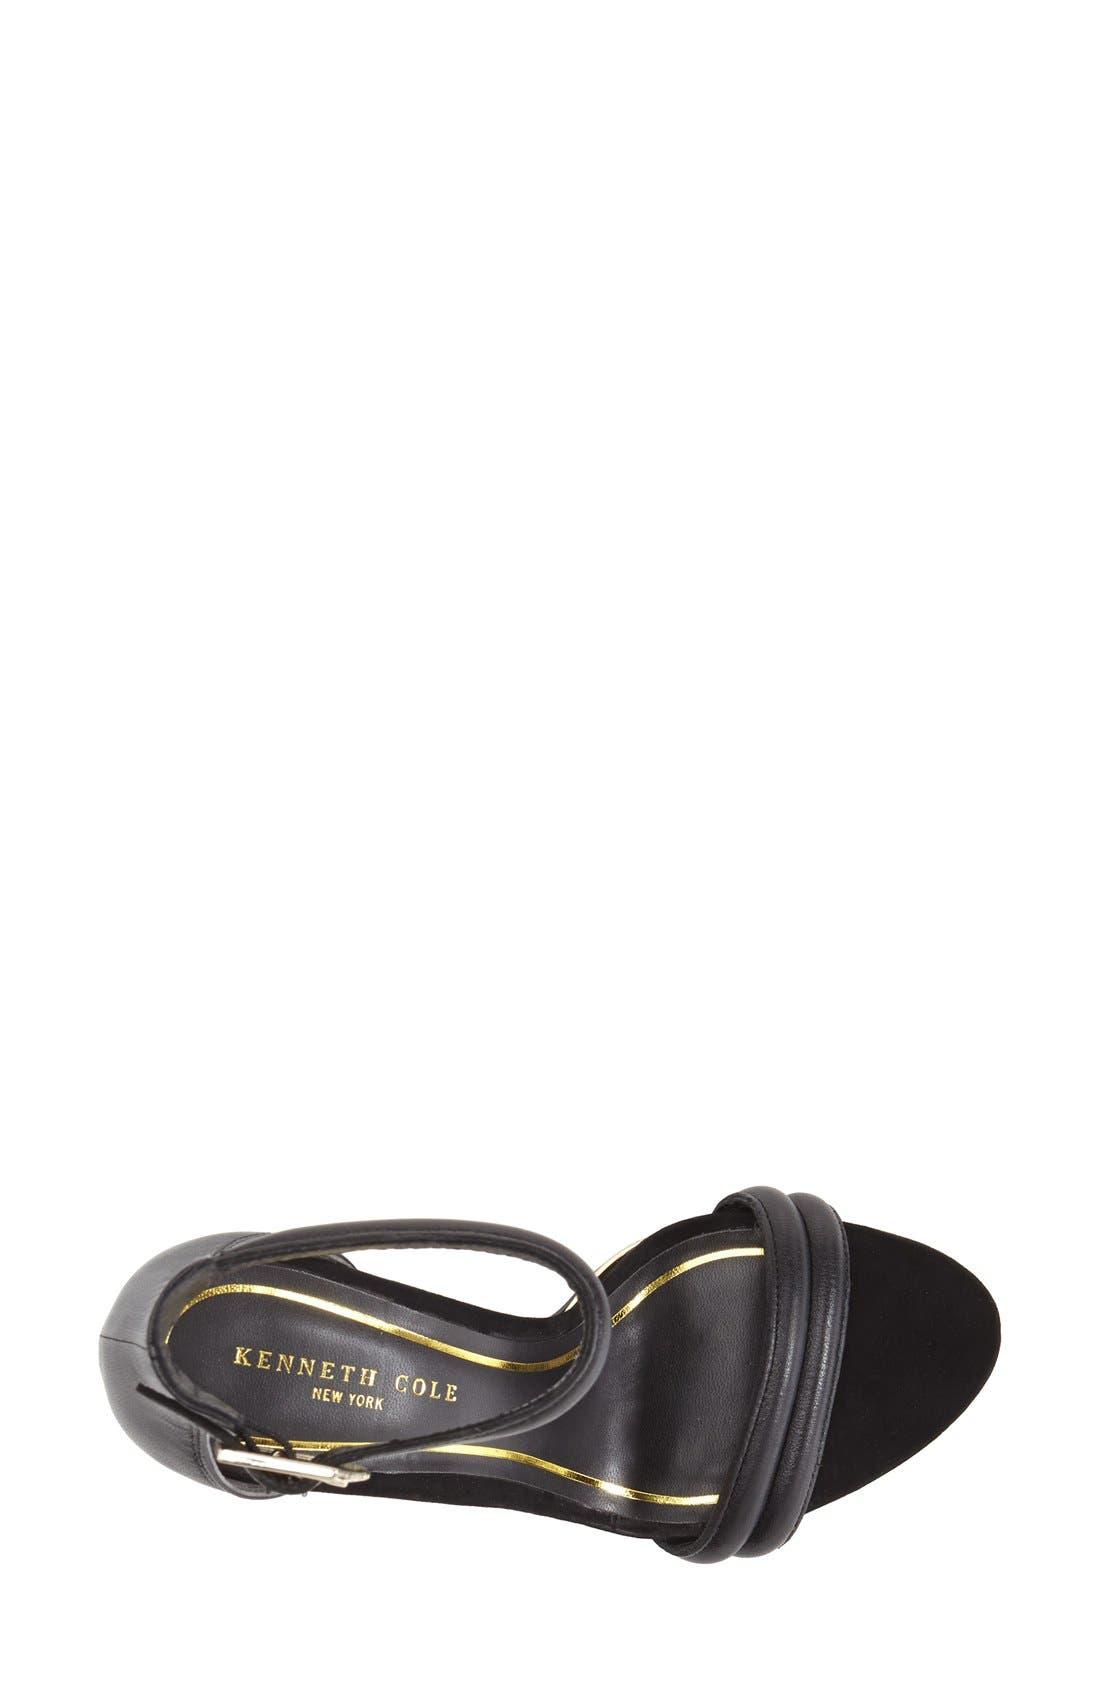 KENNETH COLE NEW YORK,                             'Brooke' Ankle Strap Sandal,                             Alternate thumbnail 2, color,                             BLACK LEATHER